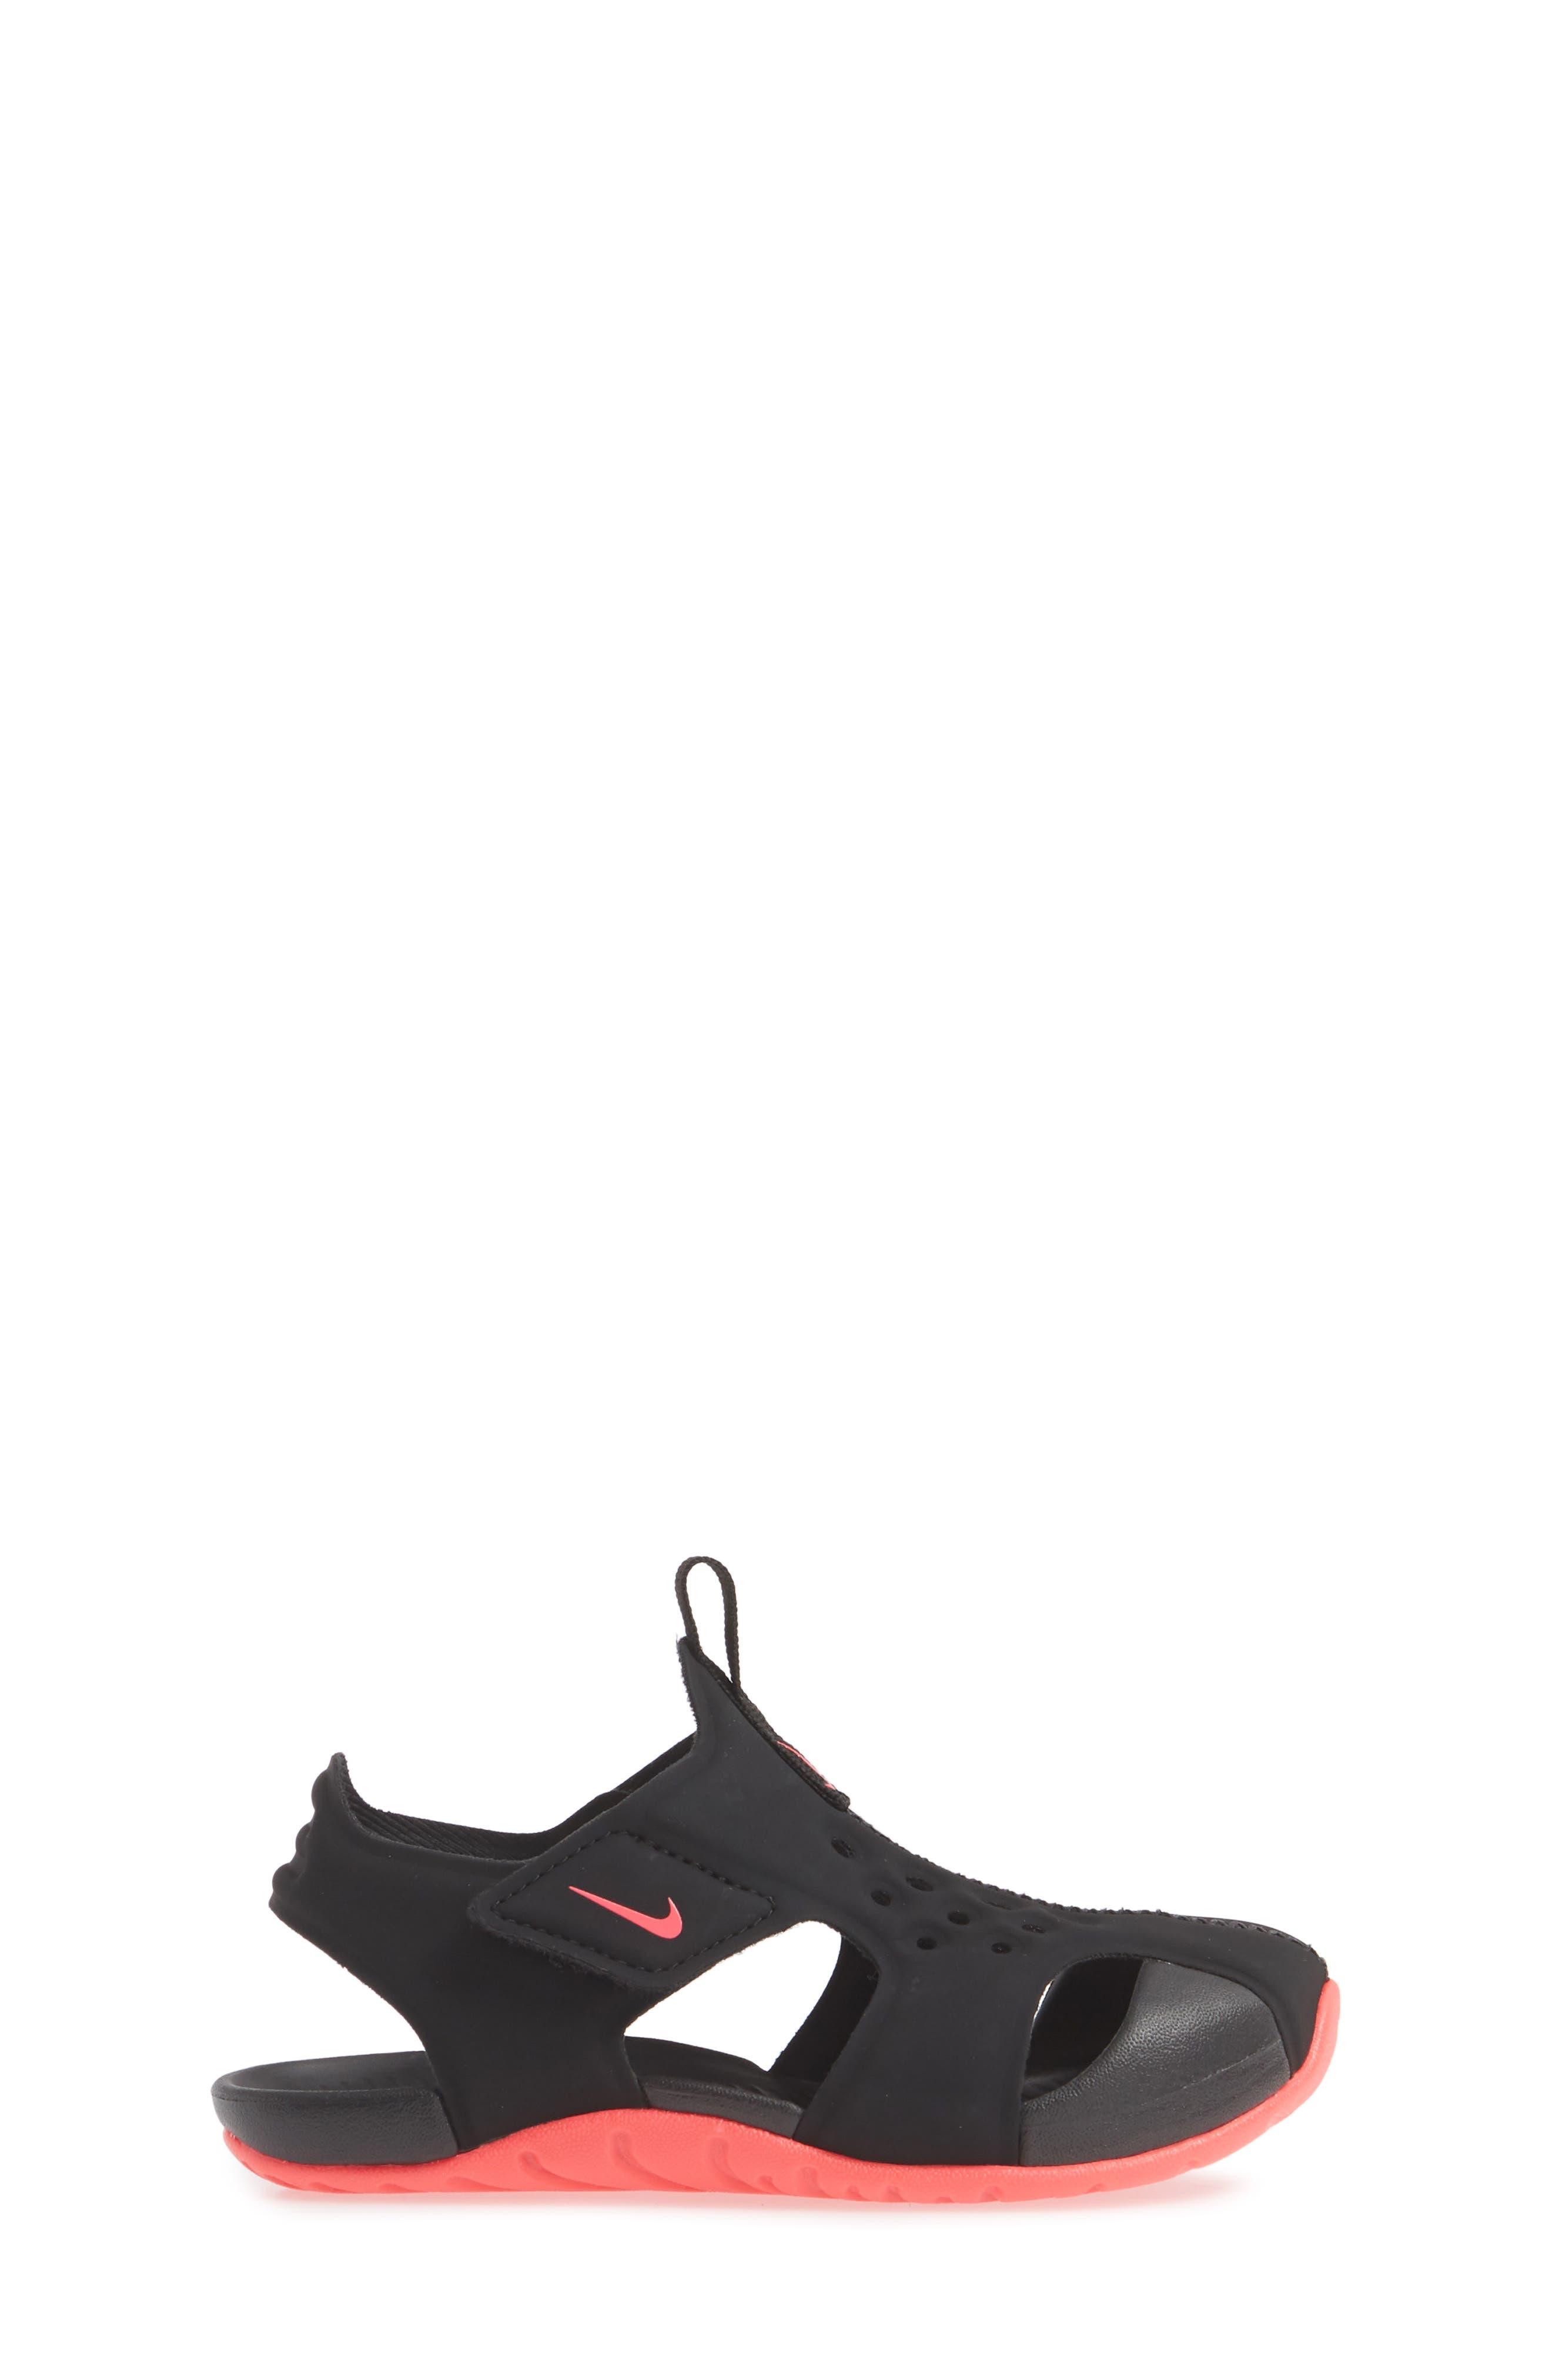 NIKE, Sunray Protect 2 Sandal, Alternate thumbnail 3, color, BLACK/ RACER PINK